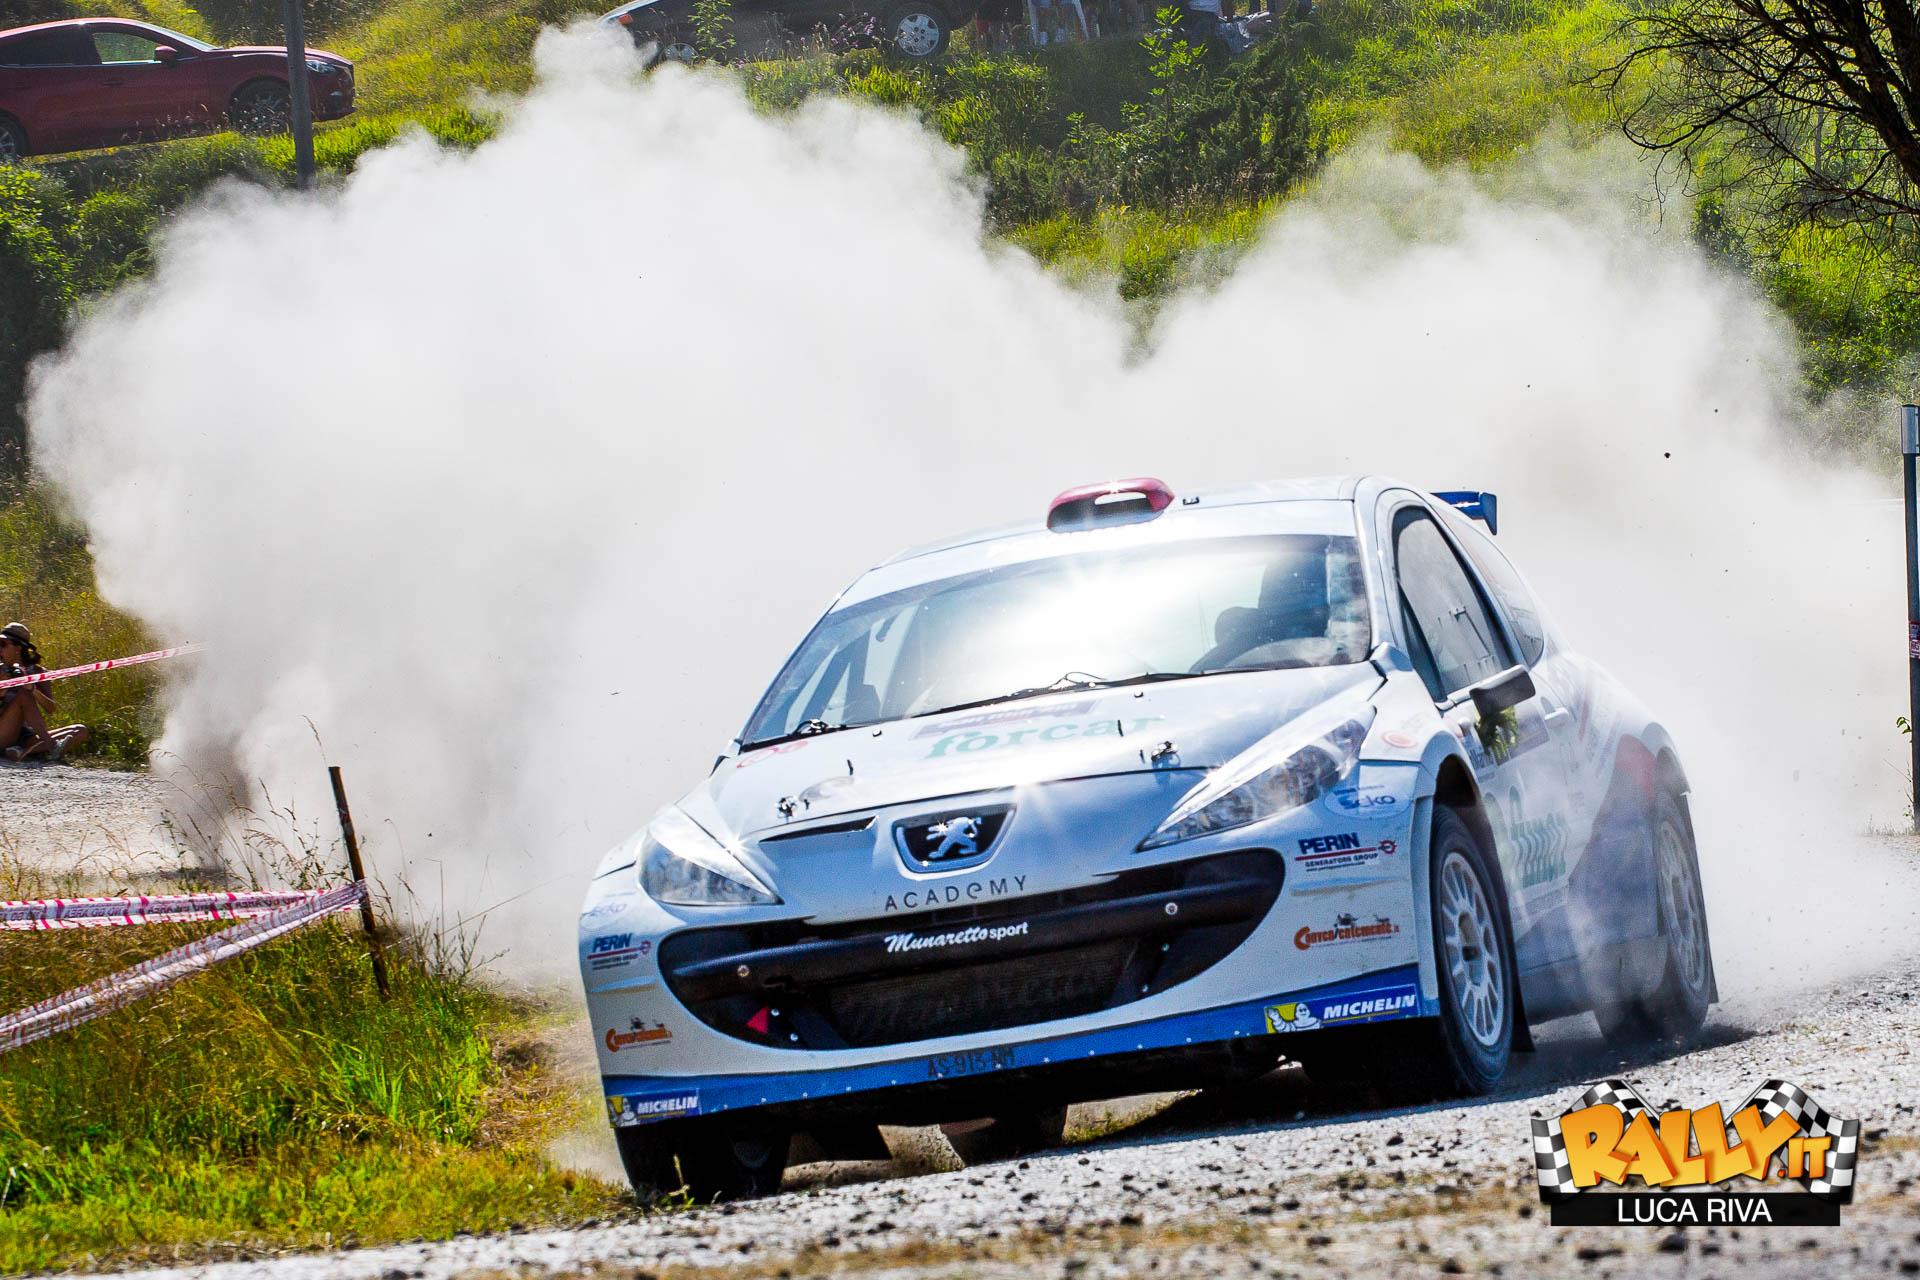 LucaRivaStudio-RallySanMarino2015-b-31.jpg